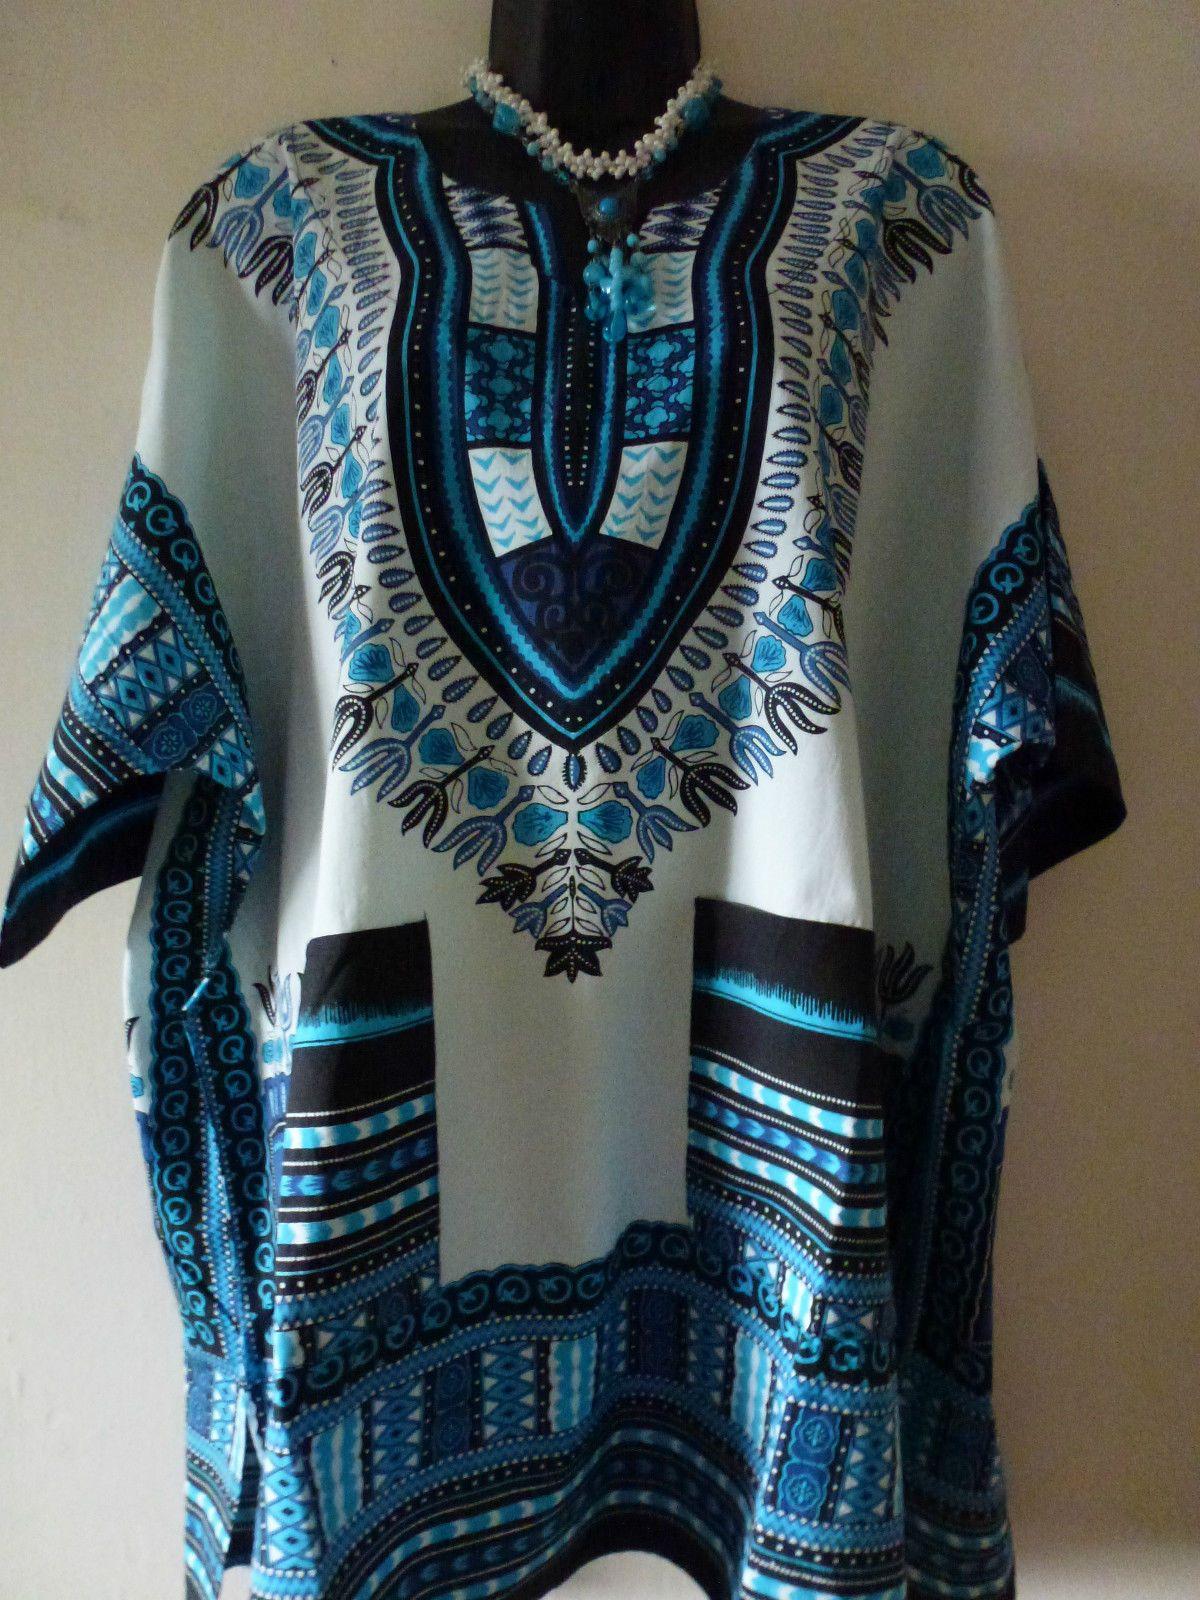 White pinafore apron ebay - Dashiki Shirt African Tribal Poncho Mexican Hippie Tribal White Multi Ebay 12